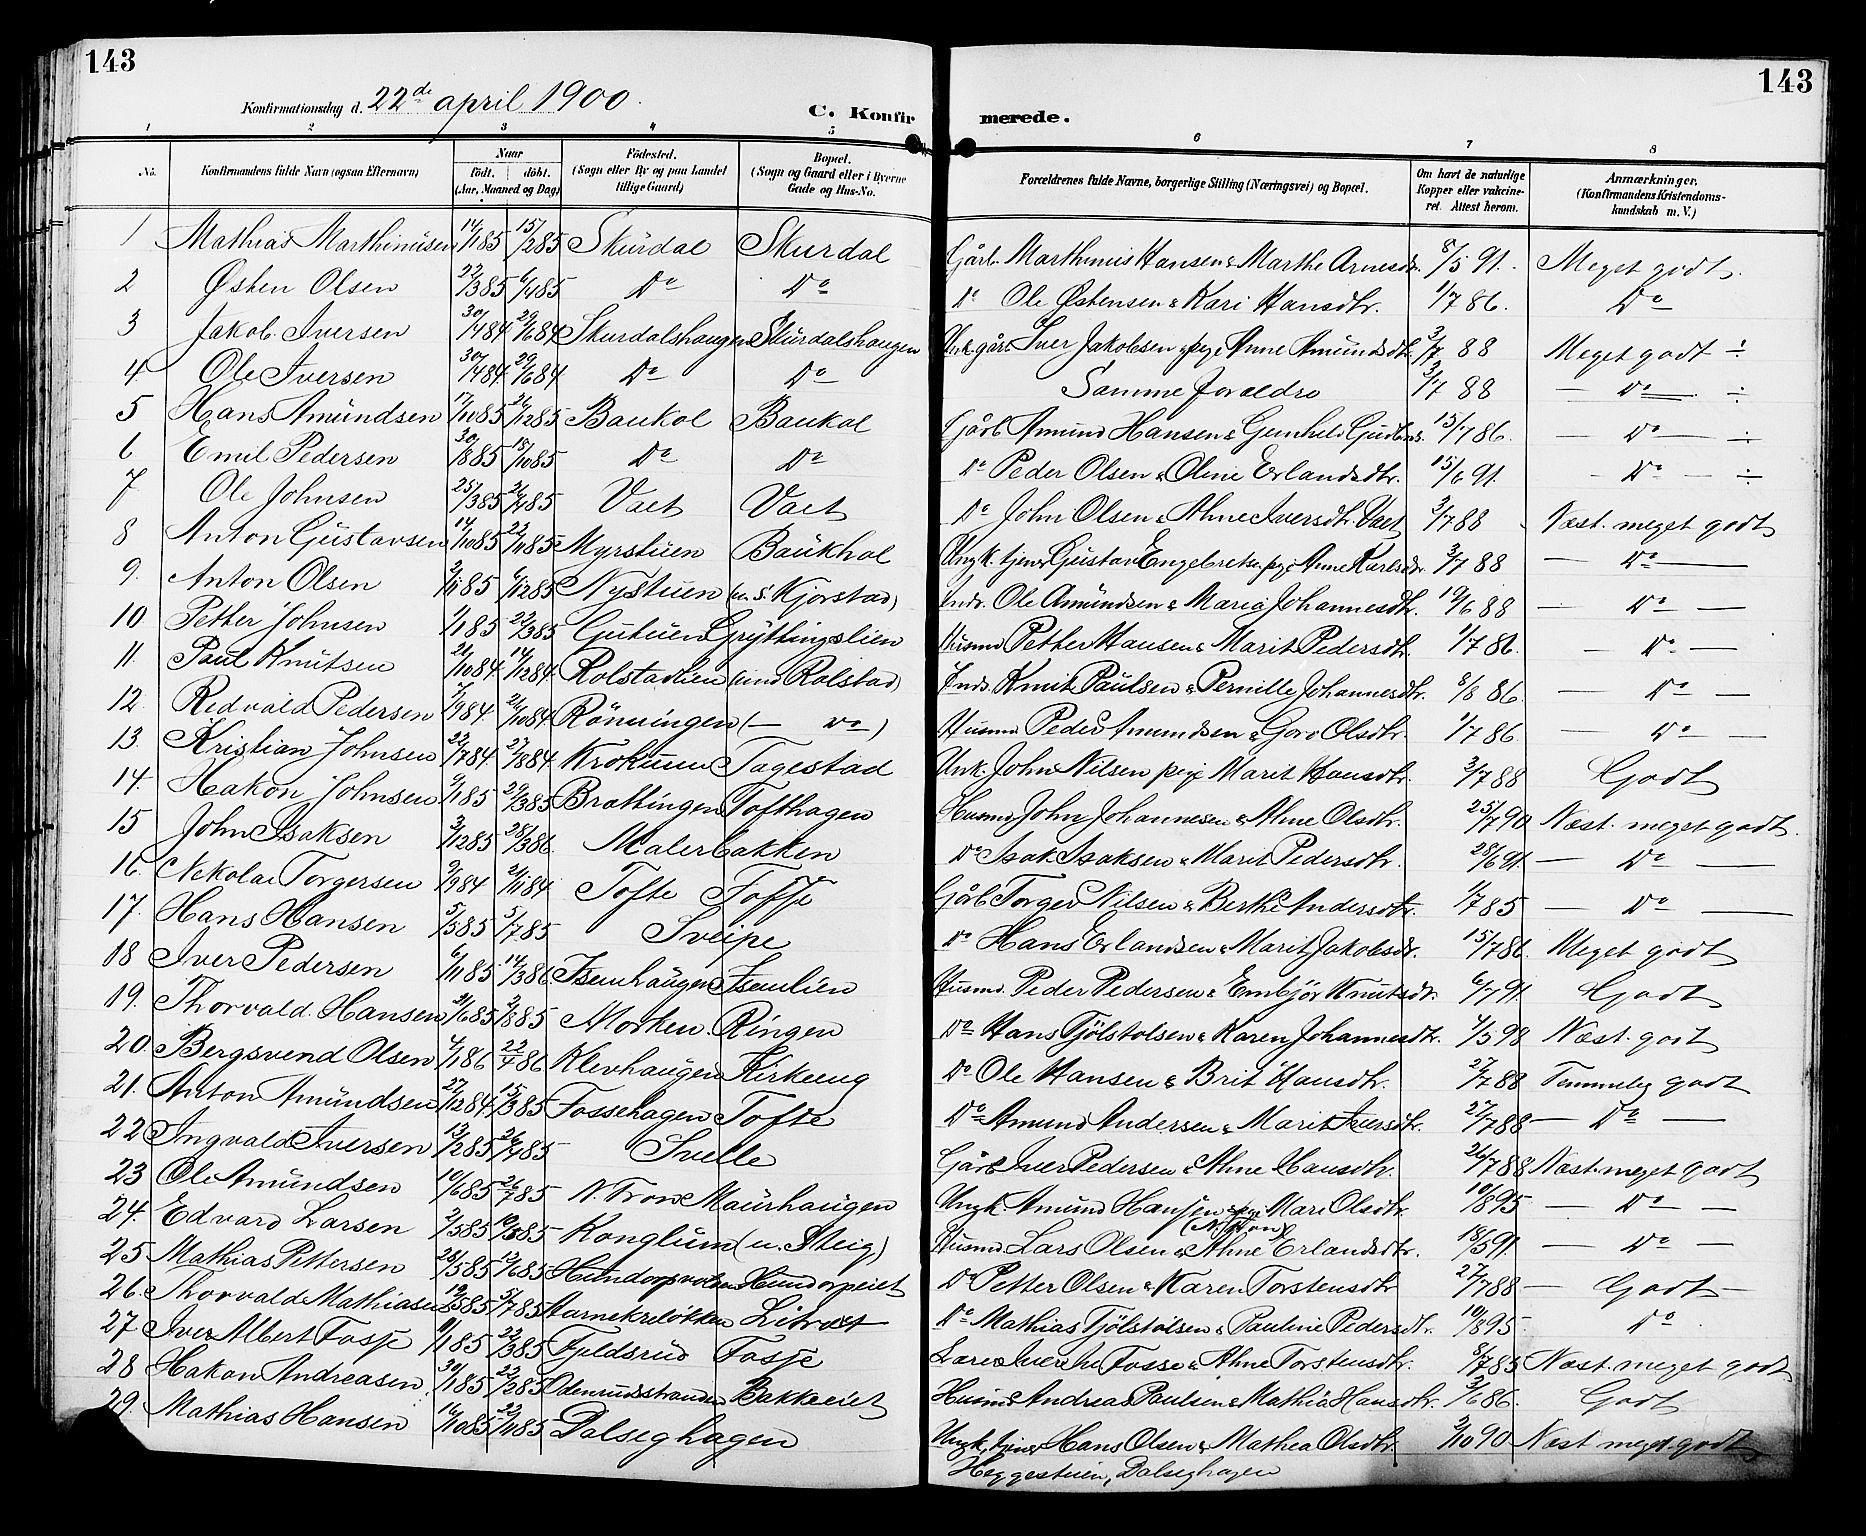 SAH, Sør-Fron prestekontor, H/Ha/Hab/L0004: Klokkerbok nr. 4, 1896-1911, s. 143